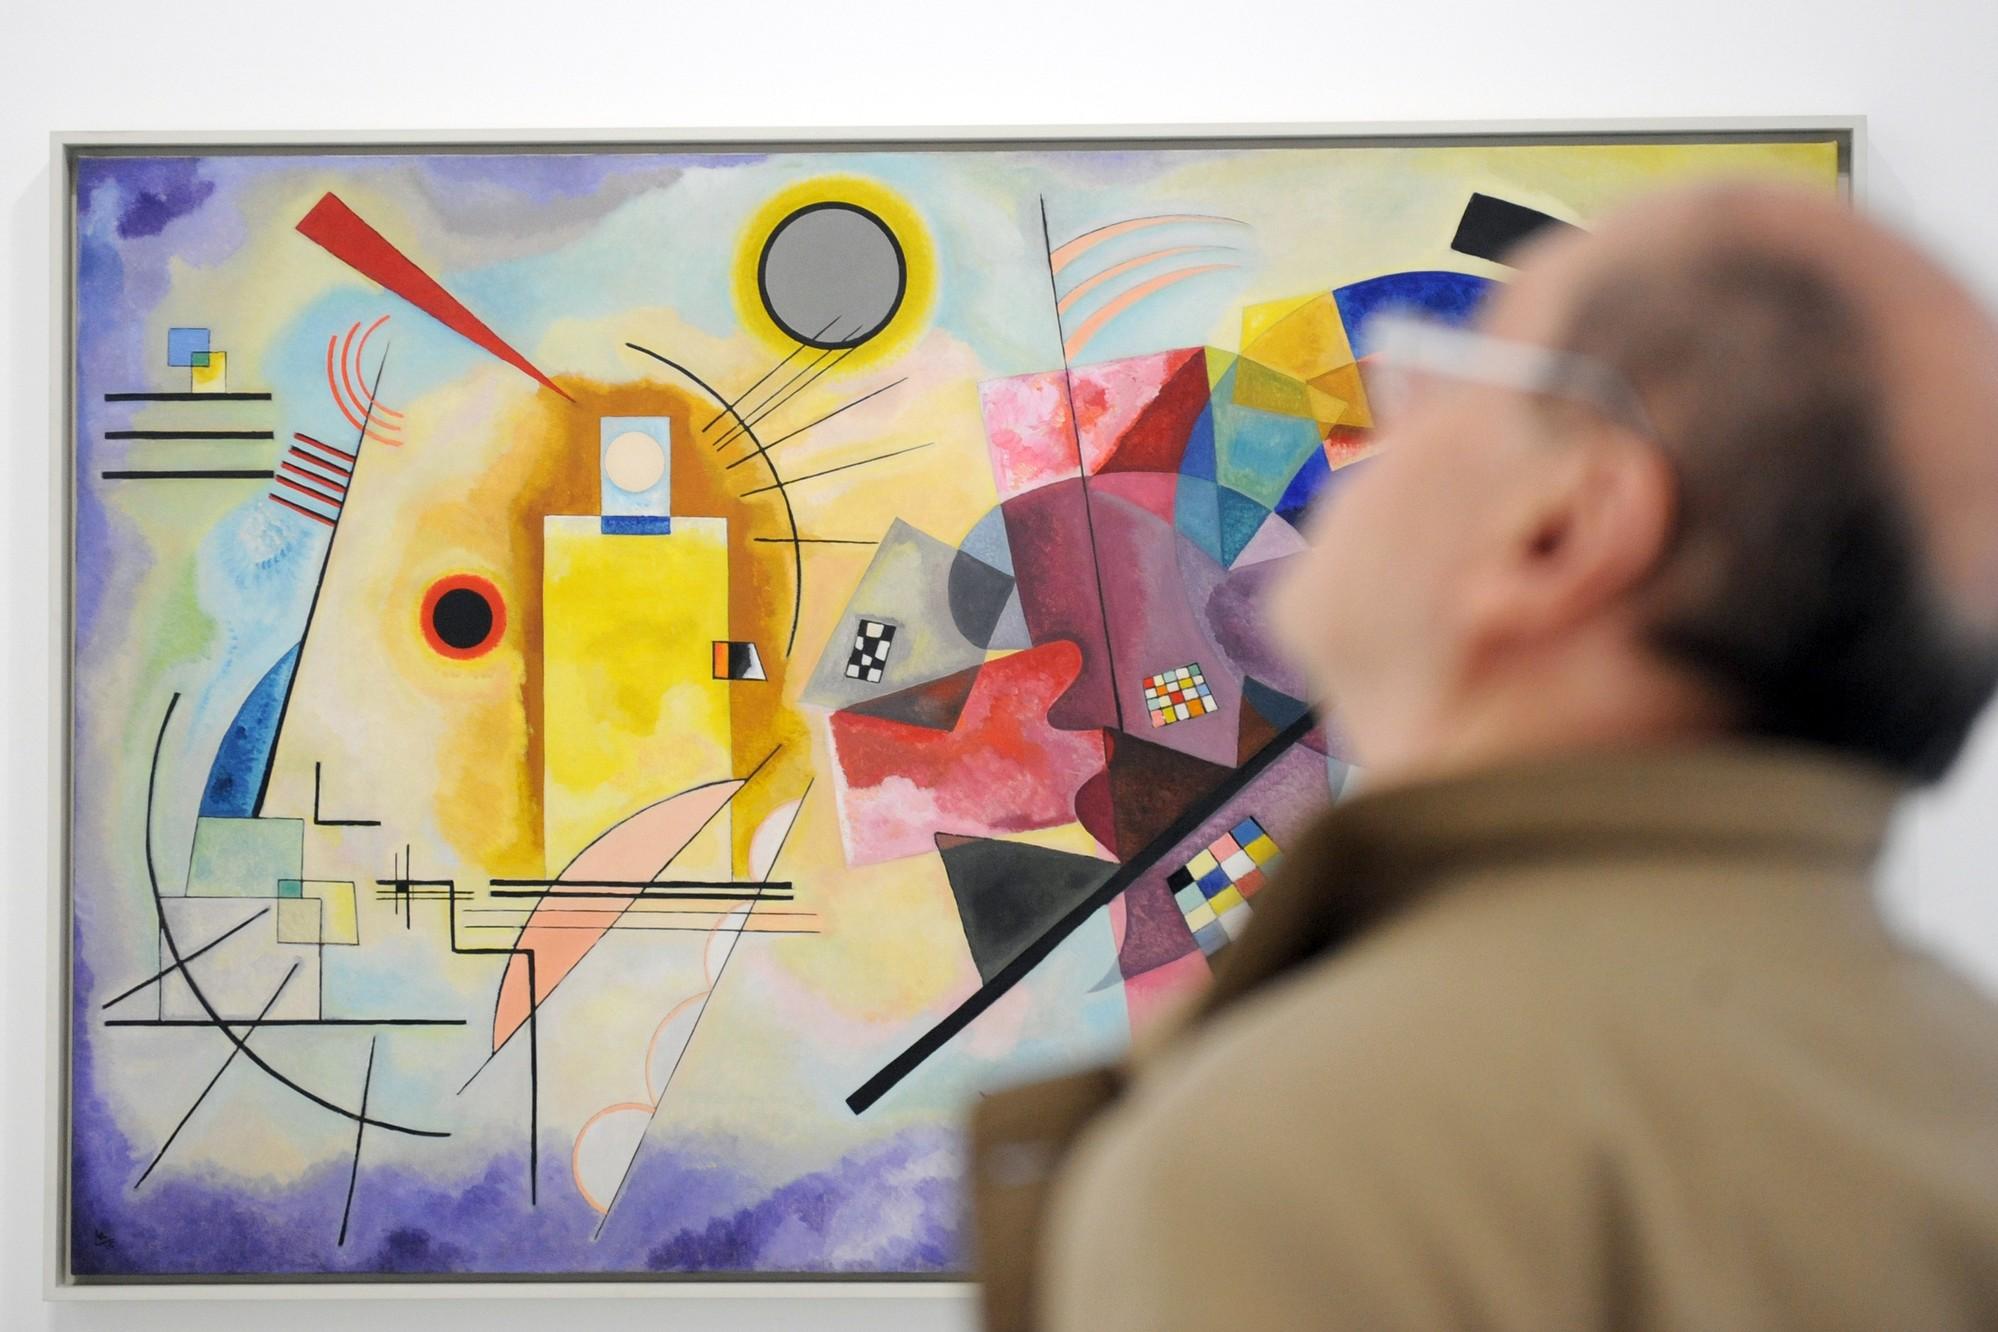 Exposition Kandinsky au Centre Pompidou en 2009